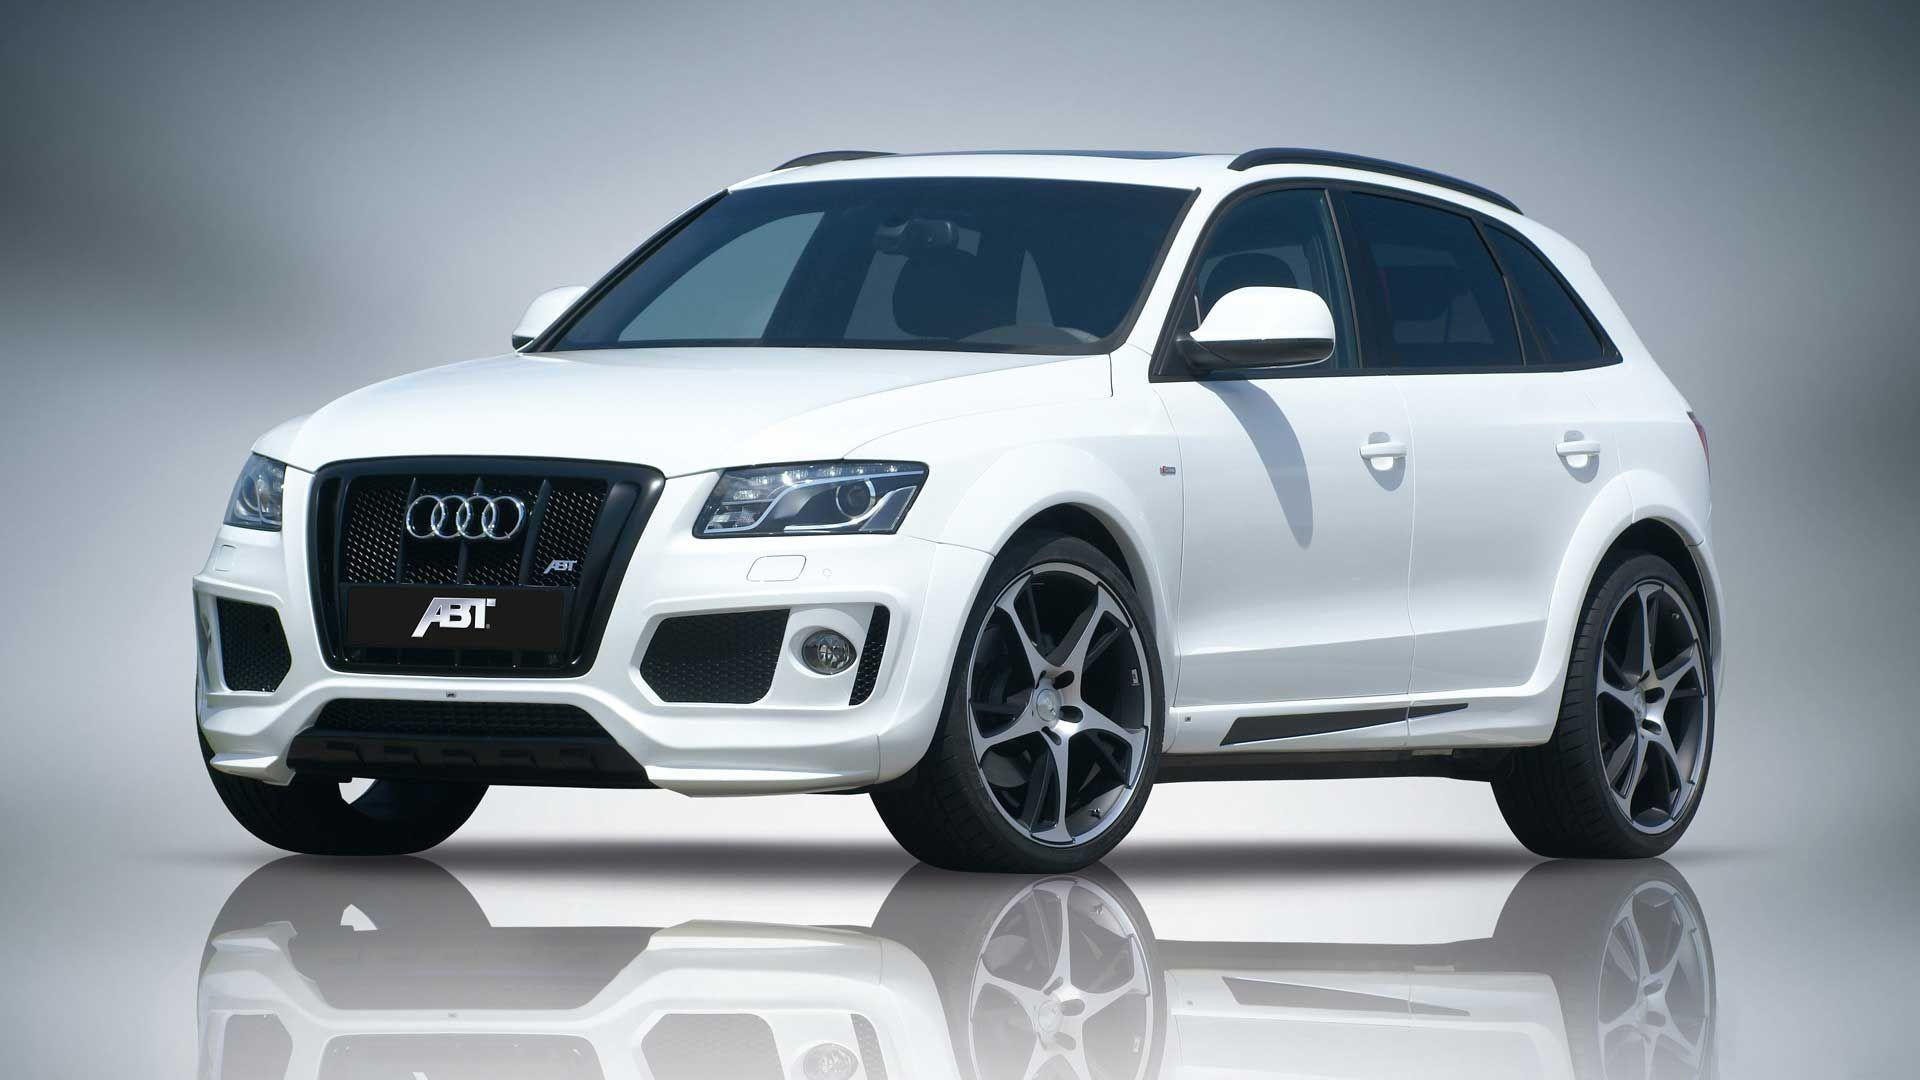 Audi Q Mis Carros Pinterest - Audi q series cars